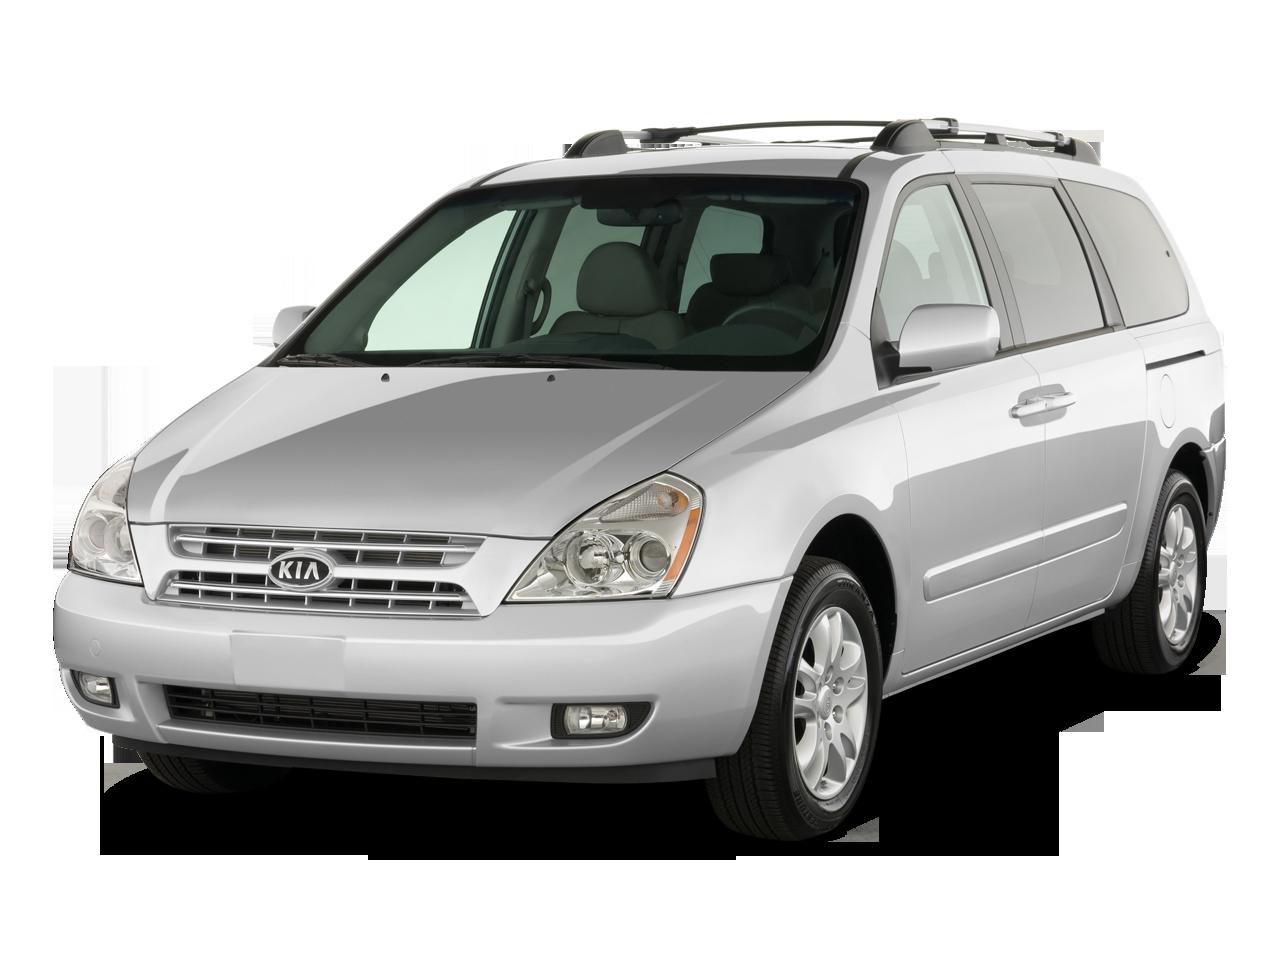 2008 kia sedona kia minivan review automobile magazine. Black Bedroom Furniture Sets. Home Design Ideas